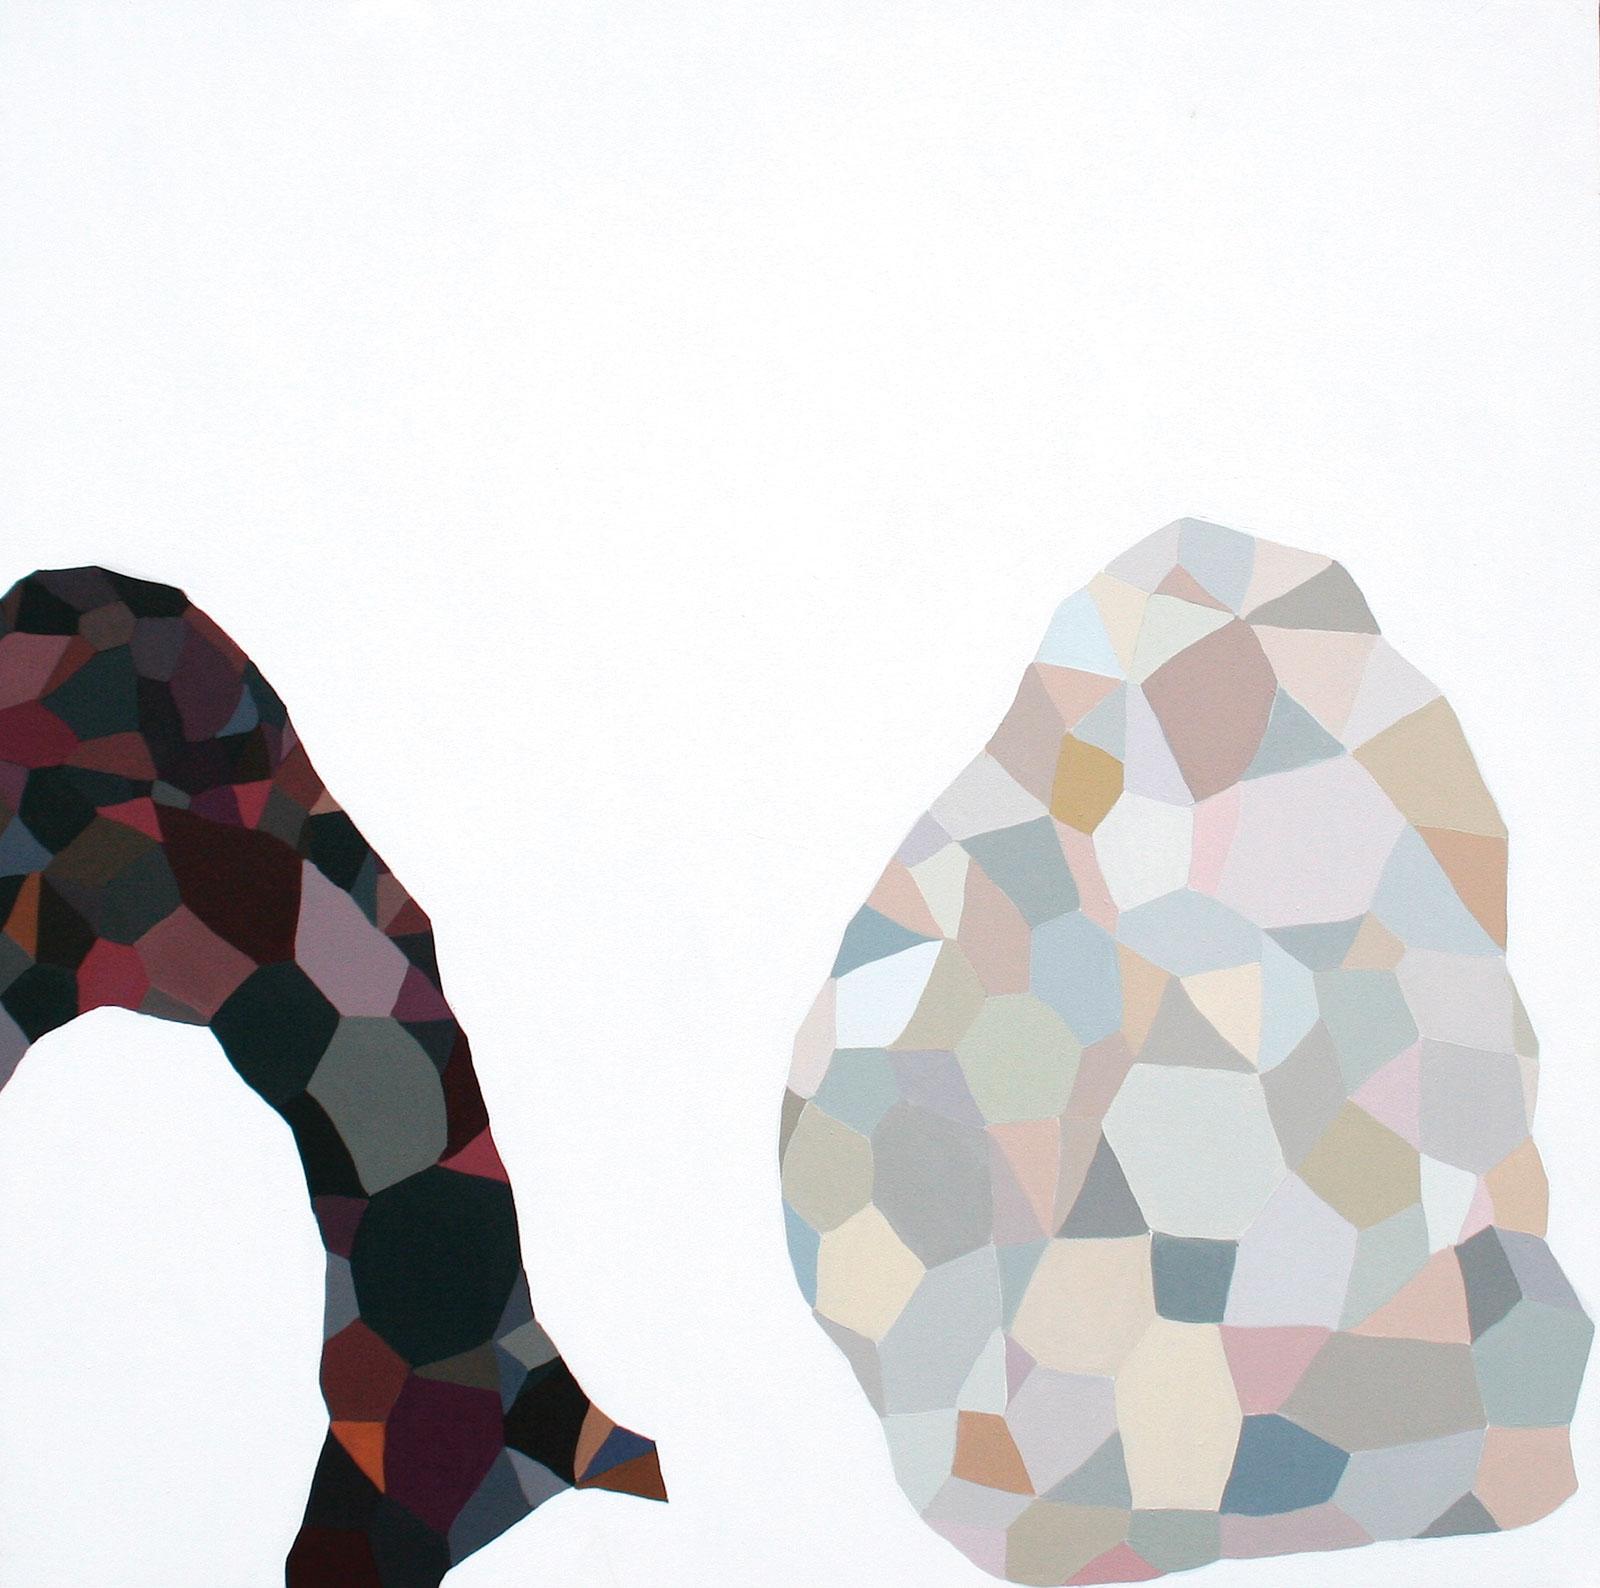 <i>Polar</i> (2011), acrylic on canvas, 48˝ × 48˝